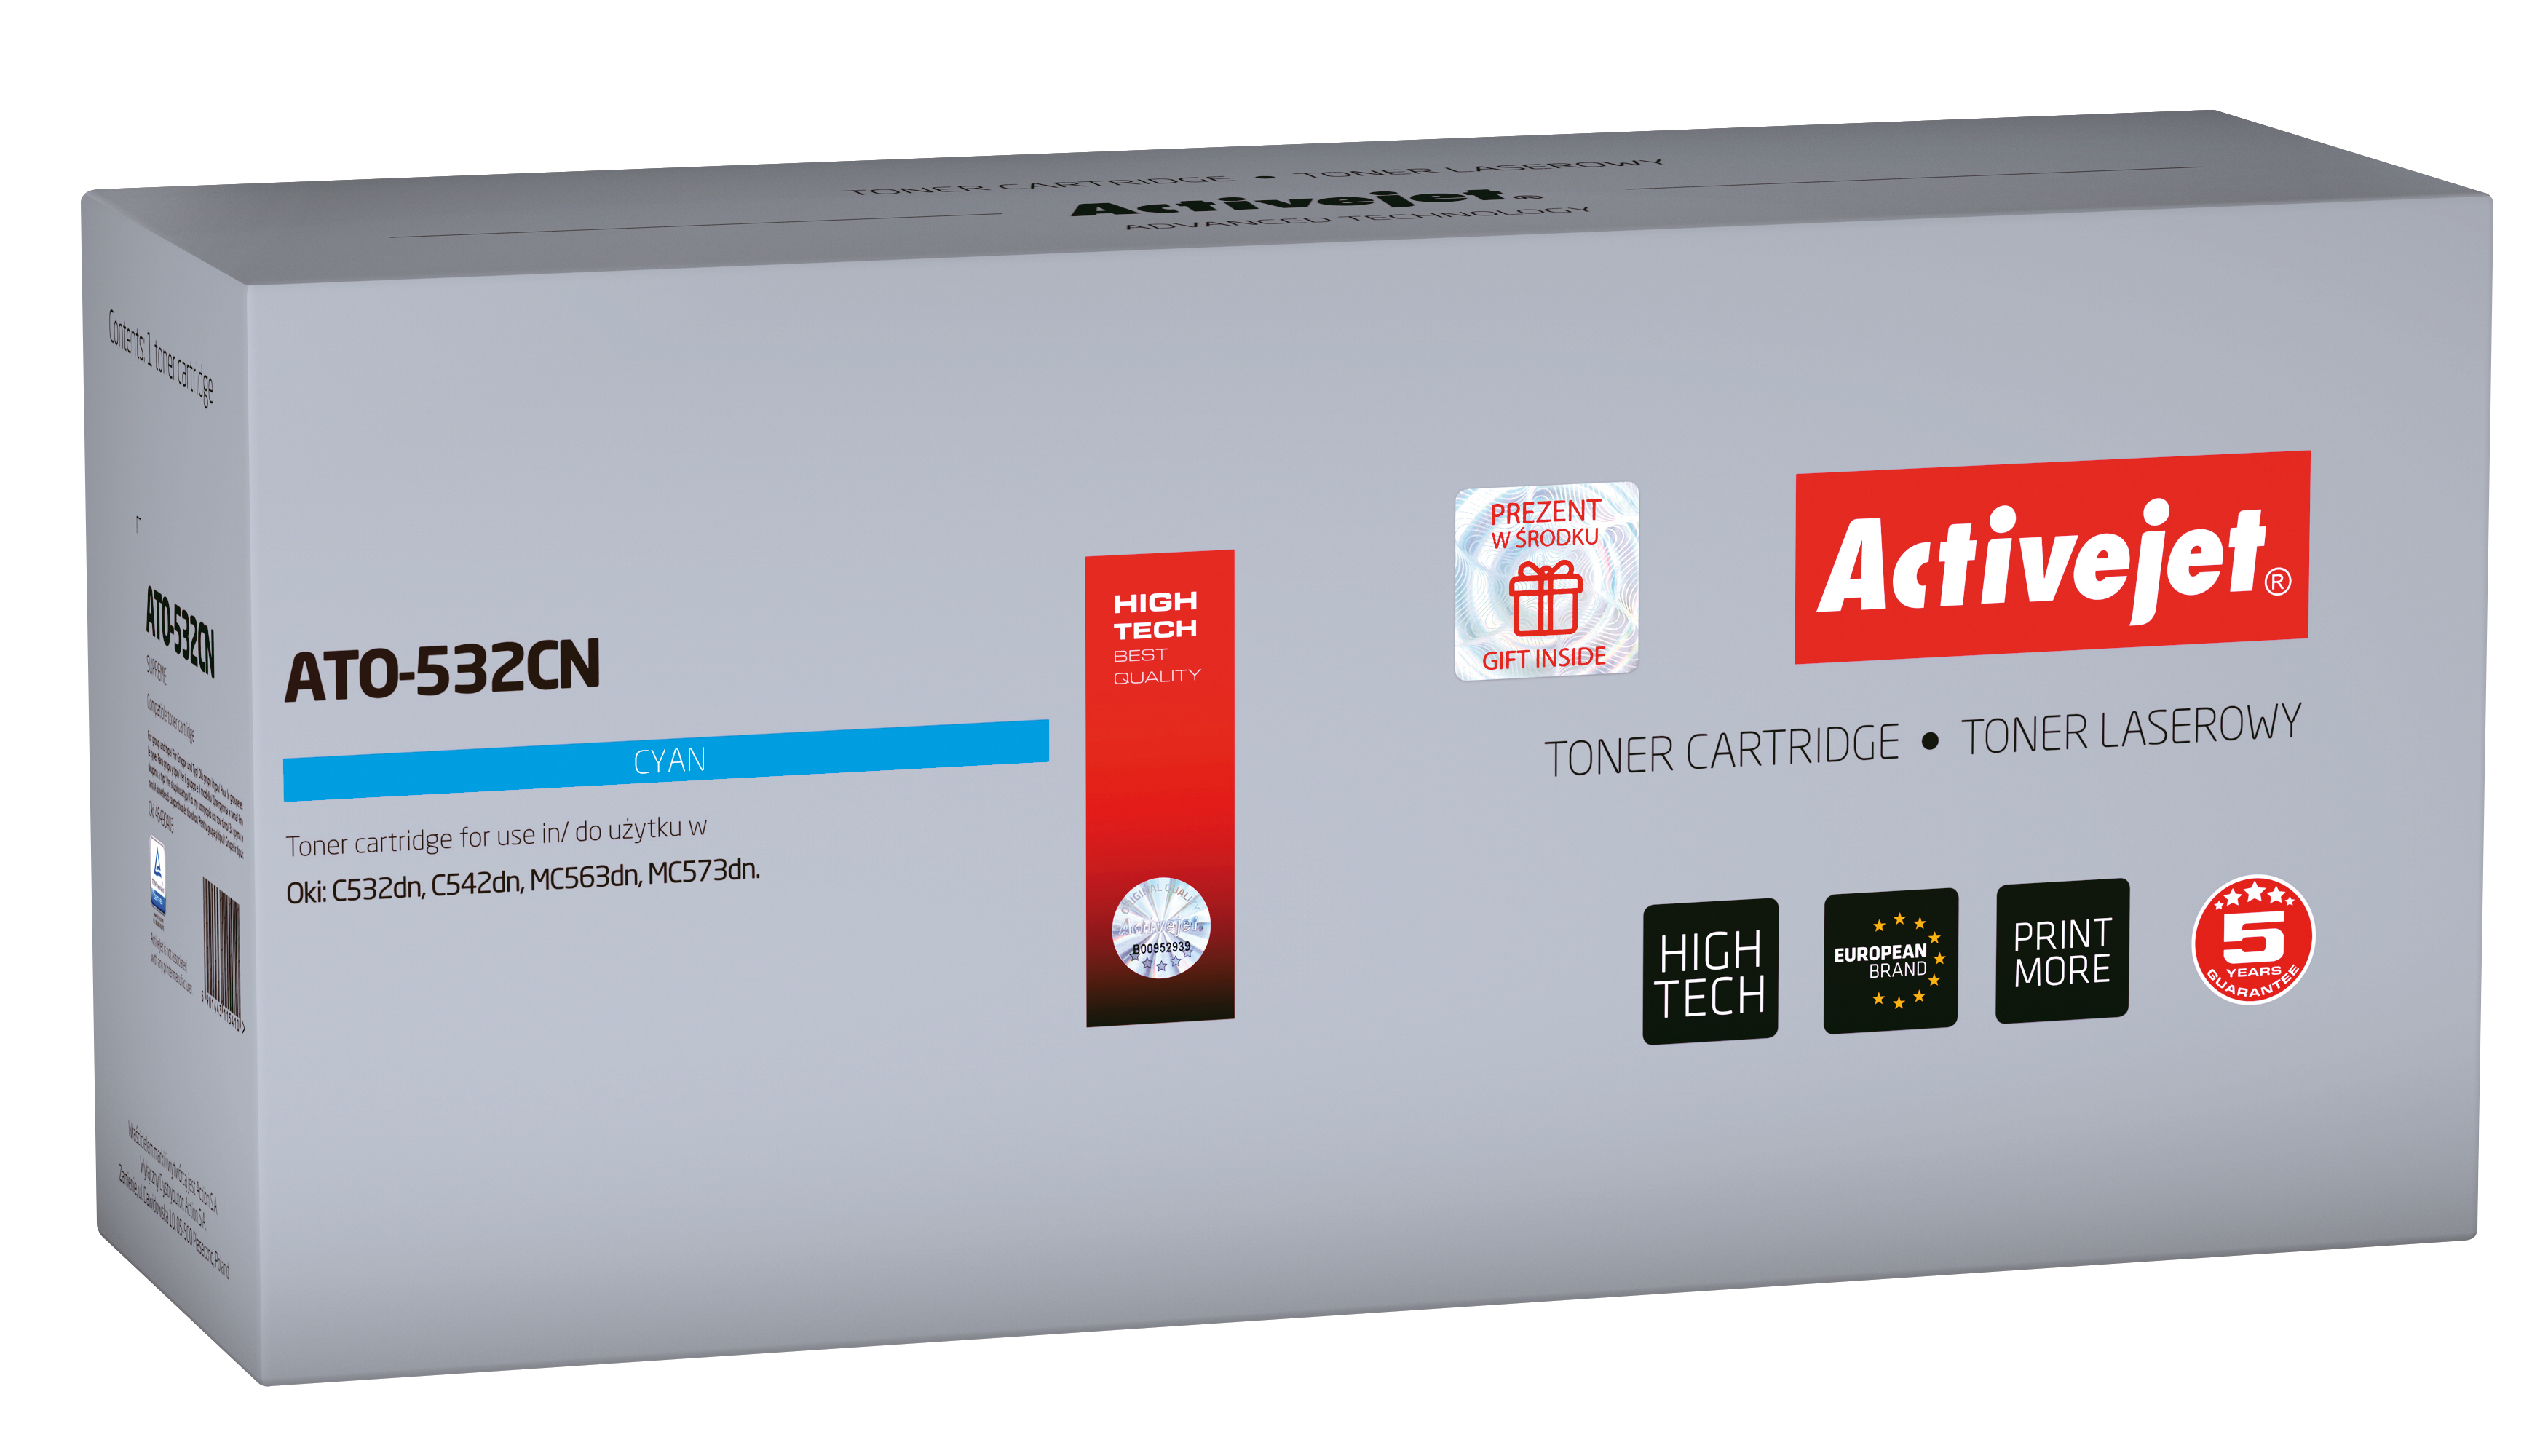 Toner Activejet  ATO-532CN do drukarki OKI, Zamiennik OKI 46490403; Supreme; 1500 stron; Błękitny.